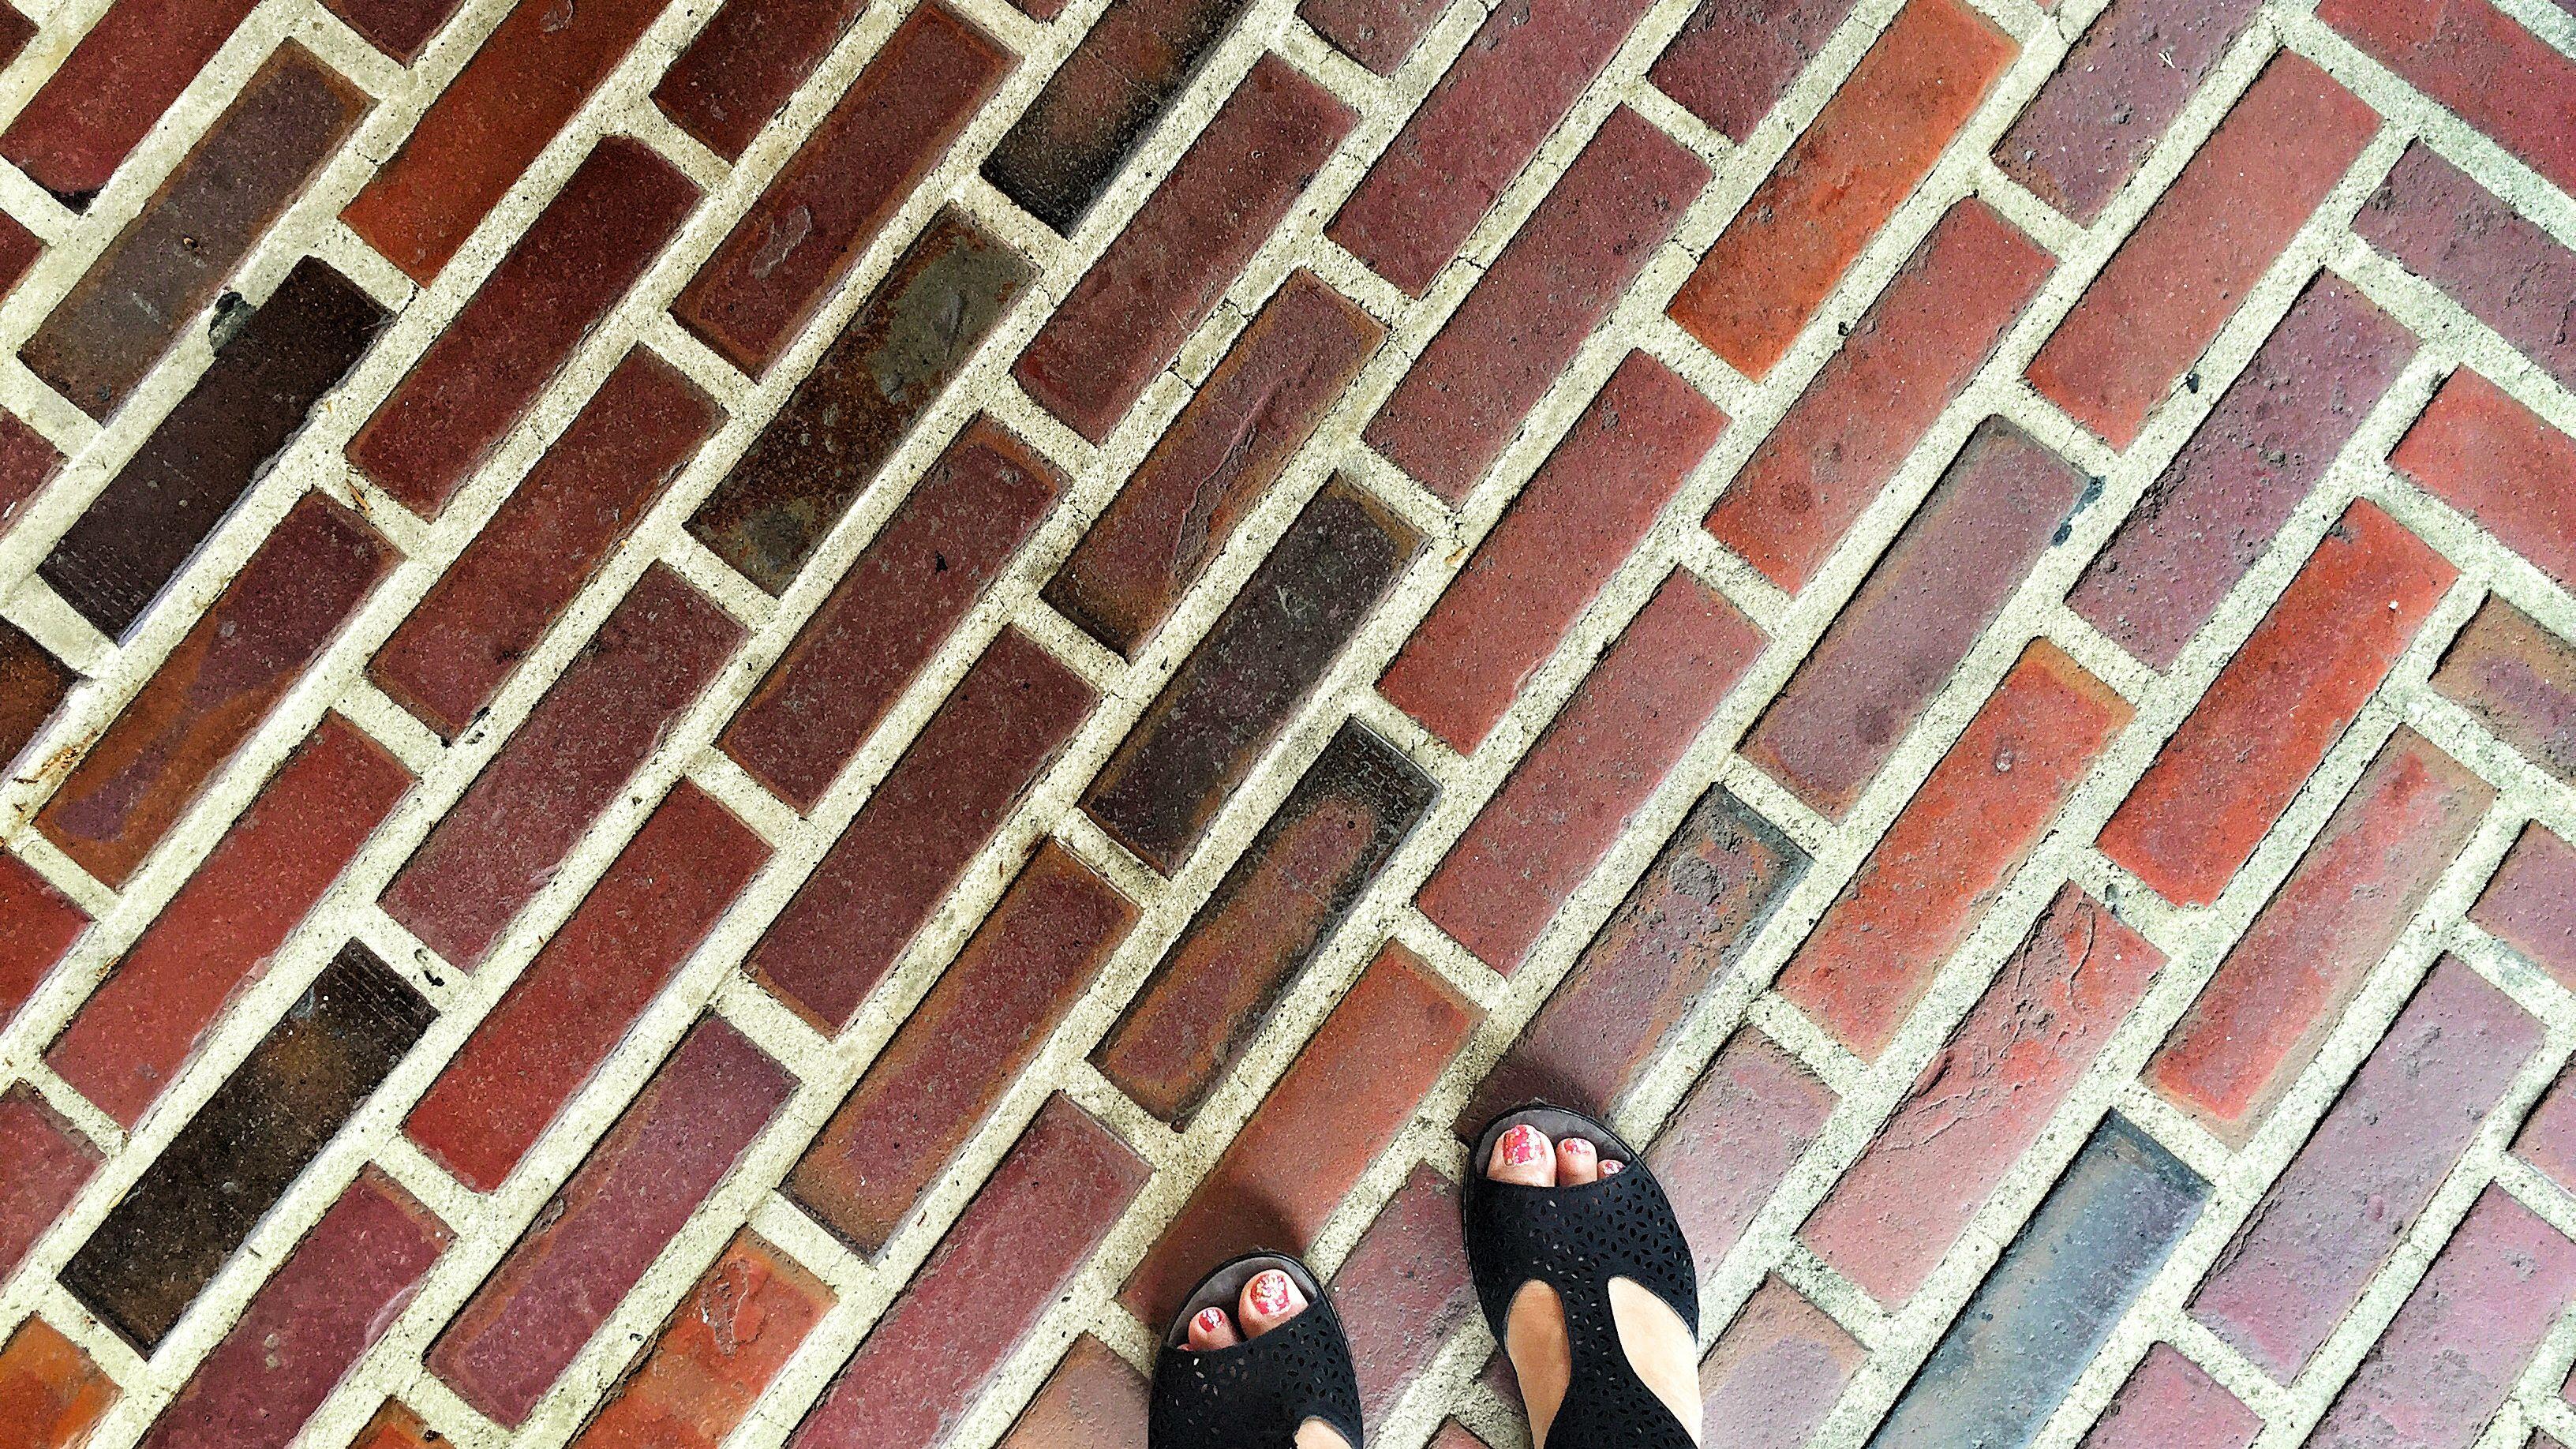 Brick Flooring Pros And Cons